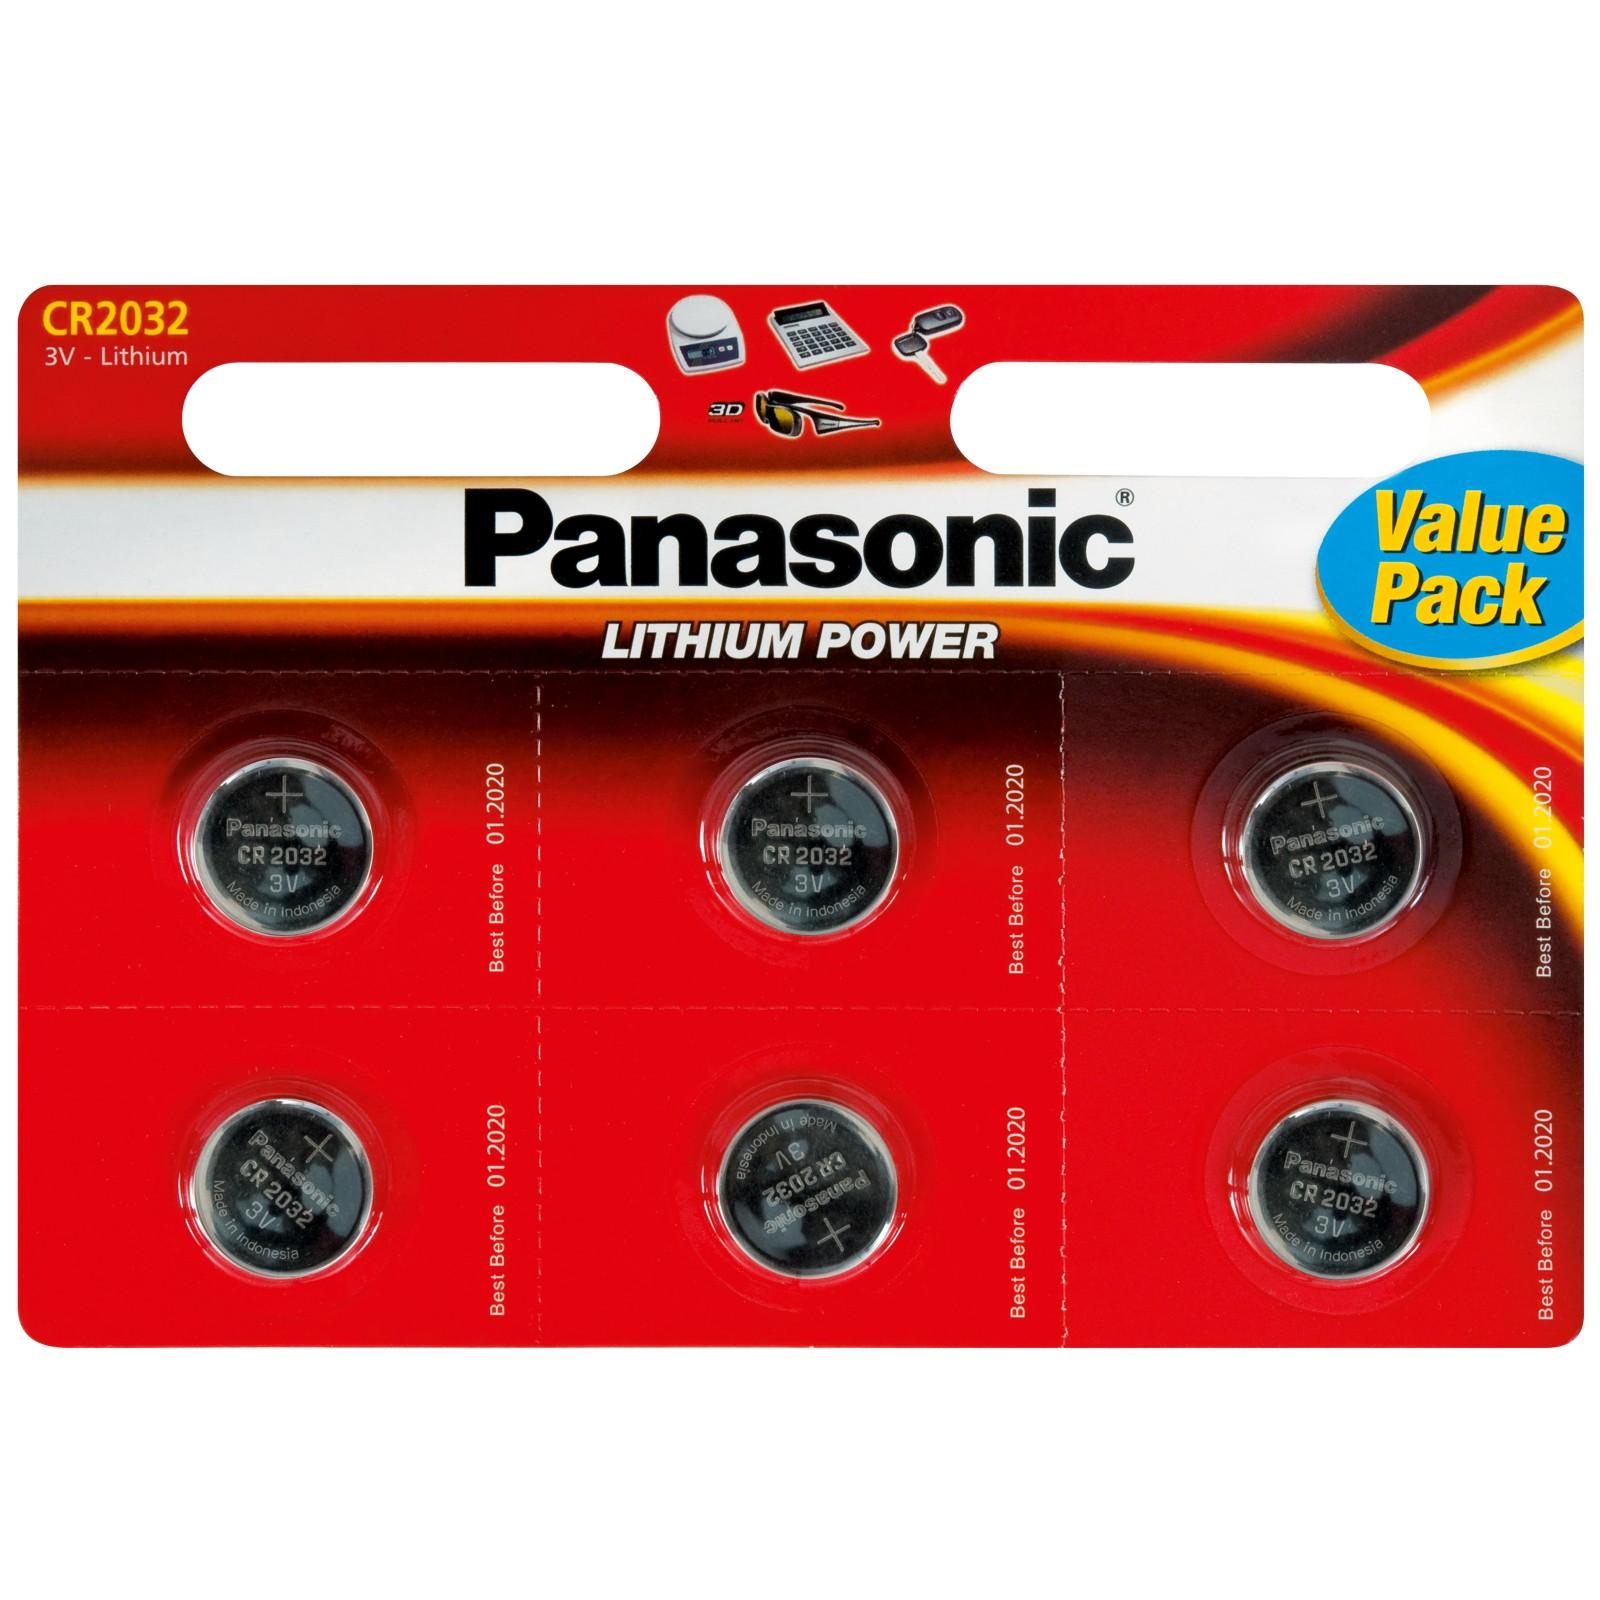 Panasonic CR-2032L/6BP Lithium Coin Batteries